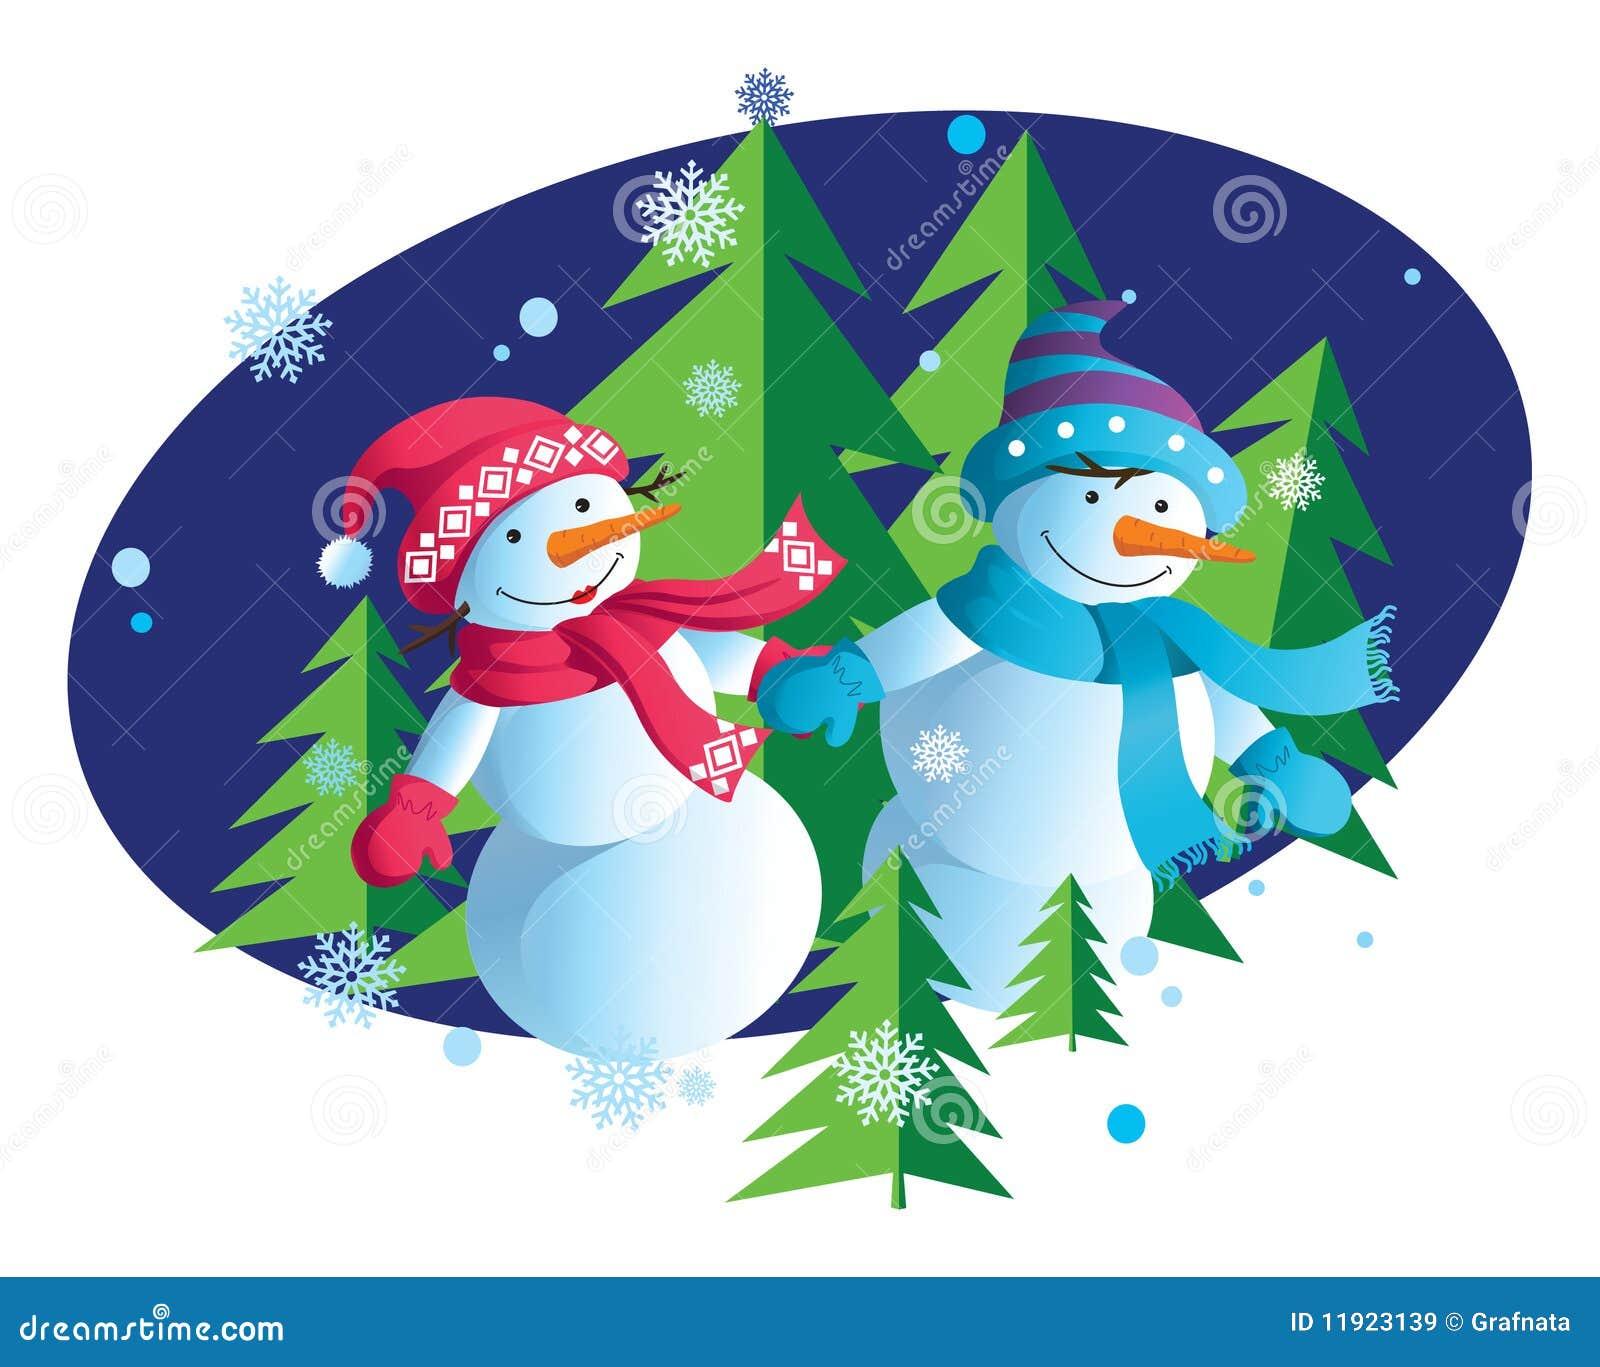 Happy new year with snowmen